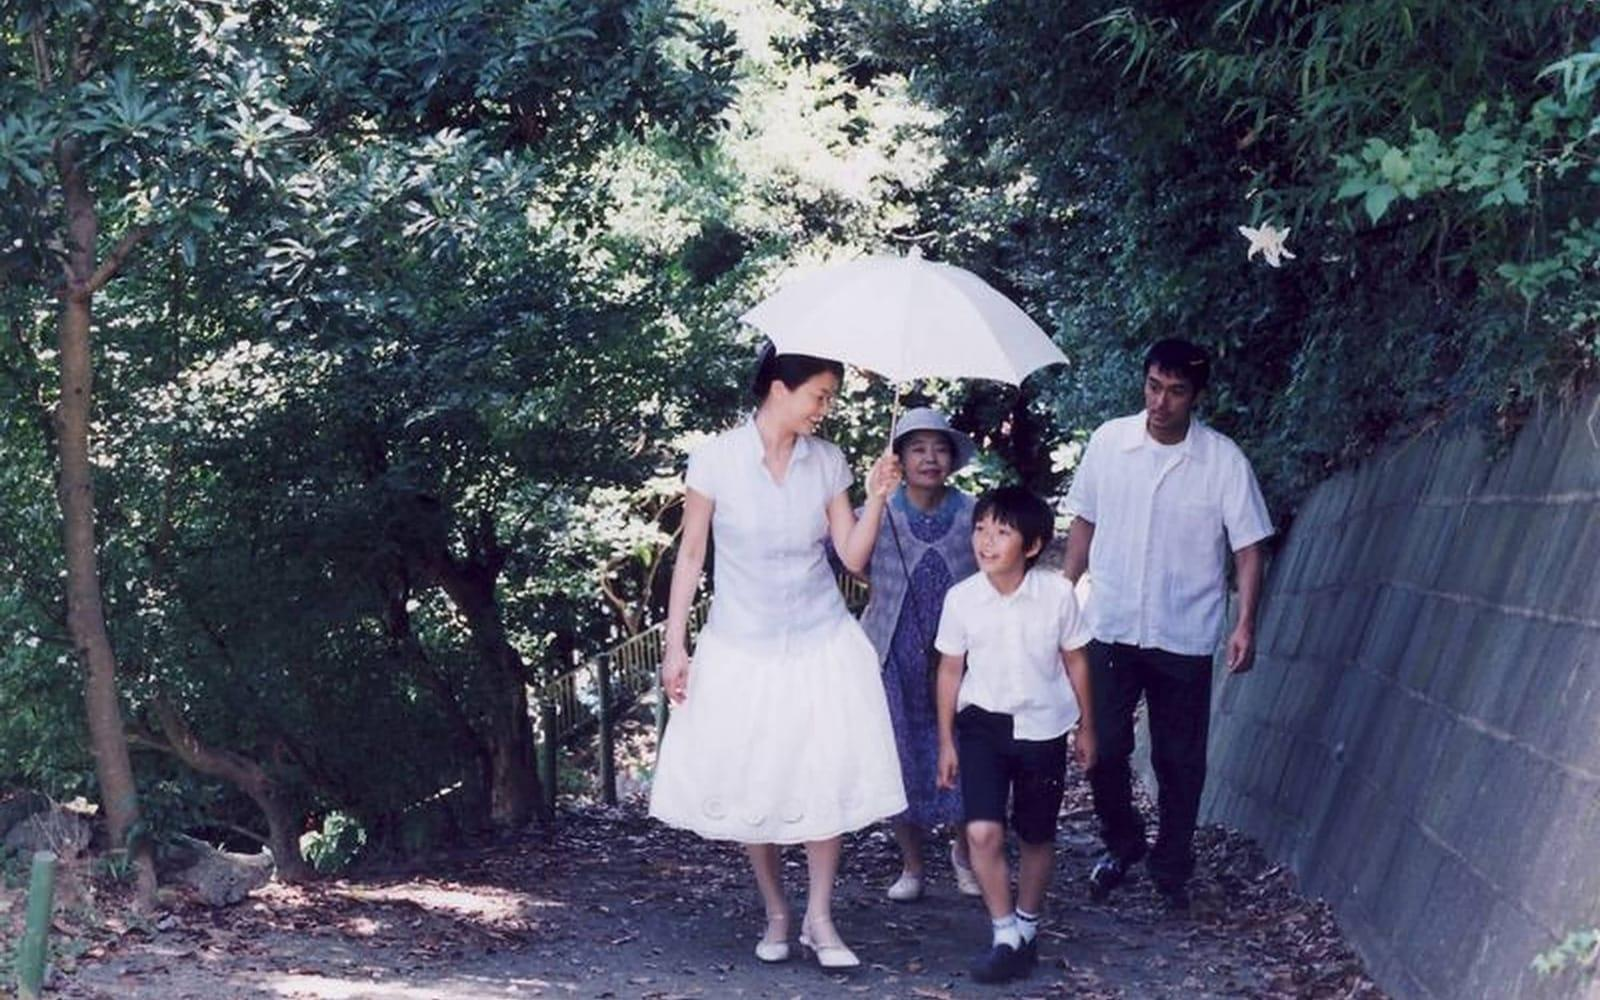 Still Walking - Hirokazu Koreeda